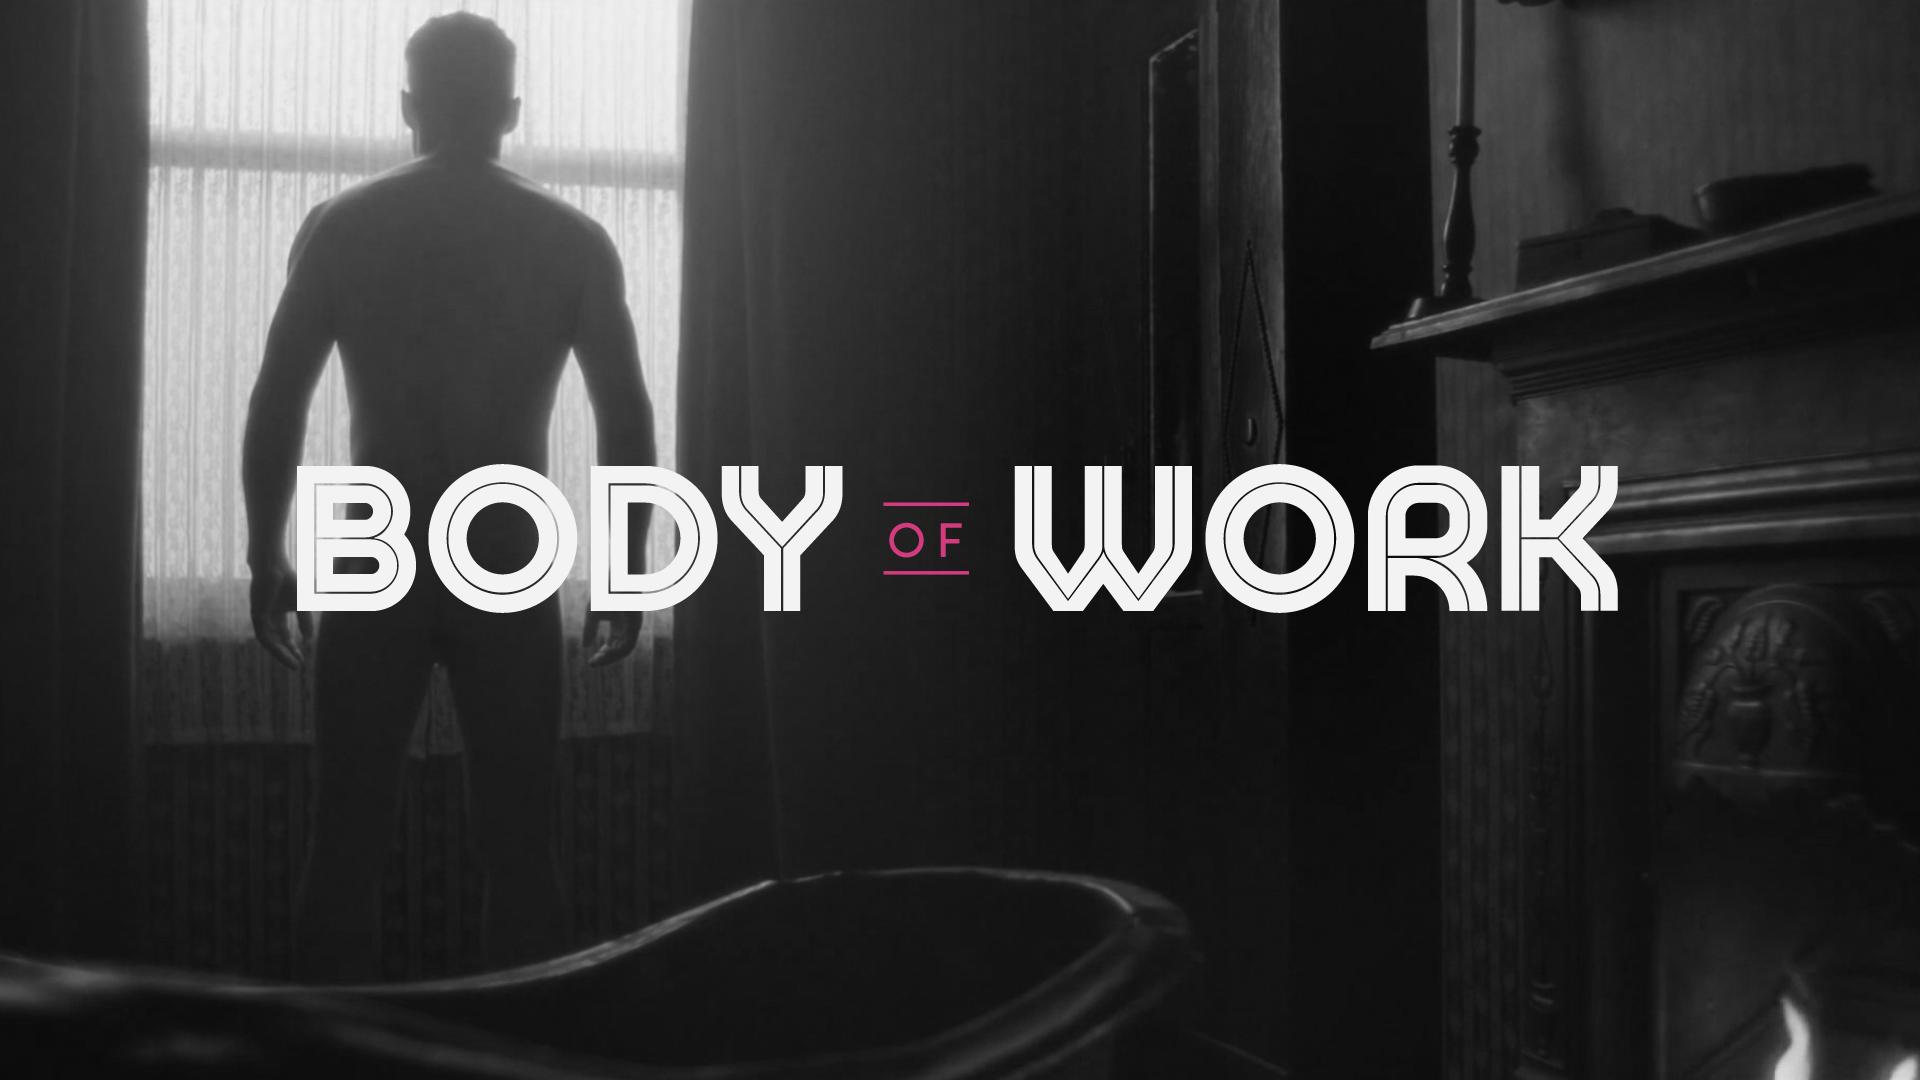 Body of Work: Cillian Murphy